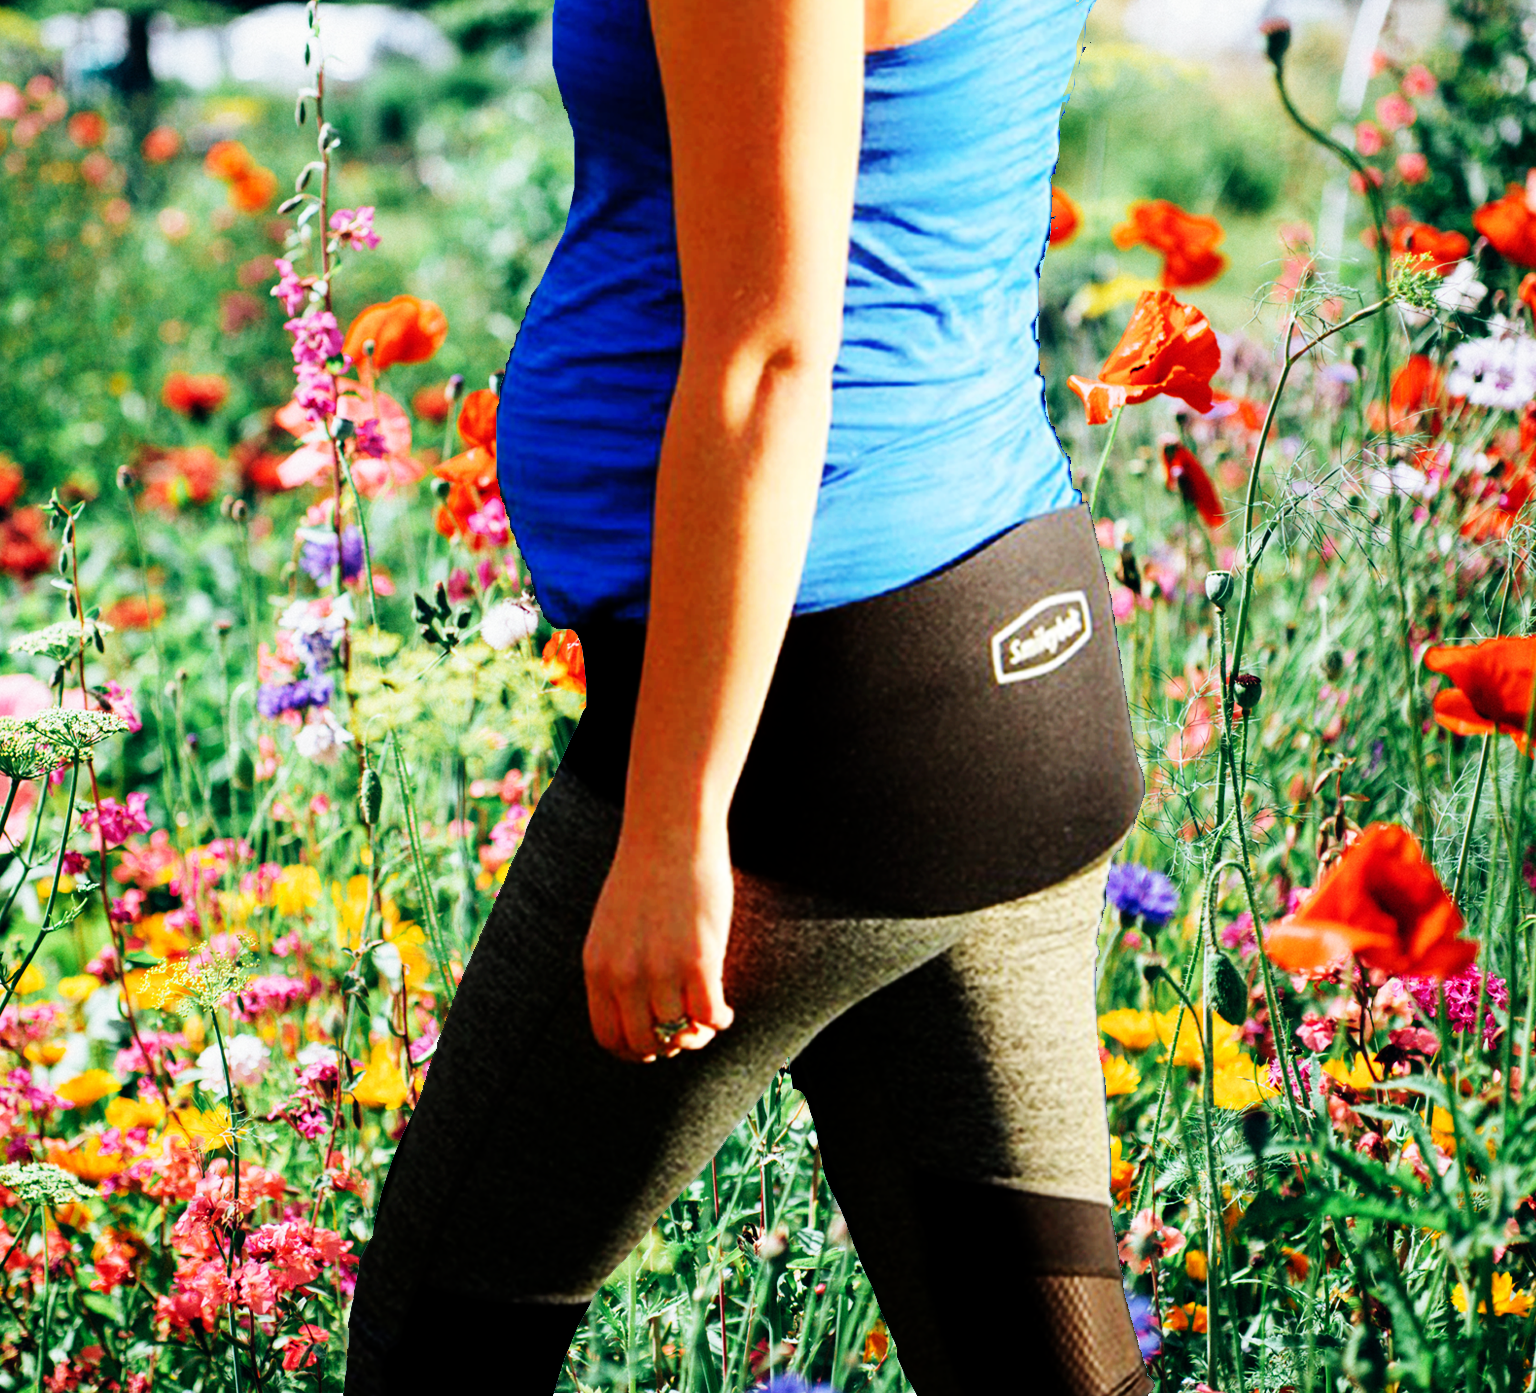 Pelvic girdle pain support belt - Smileybelt